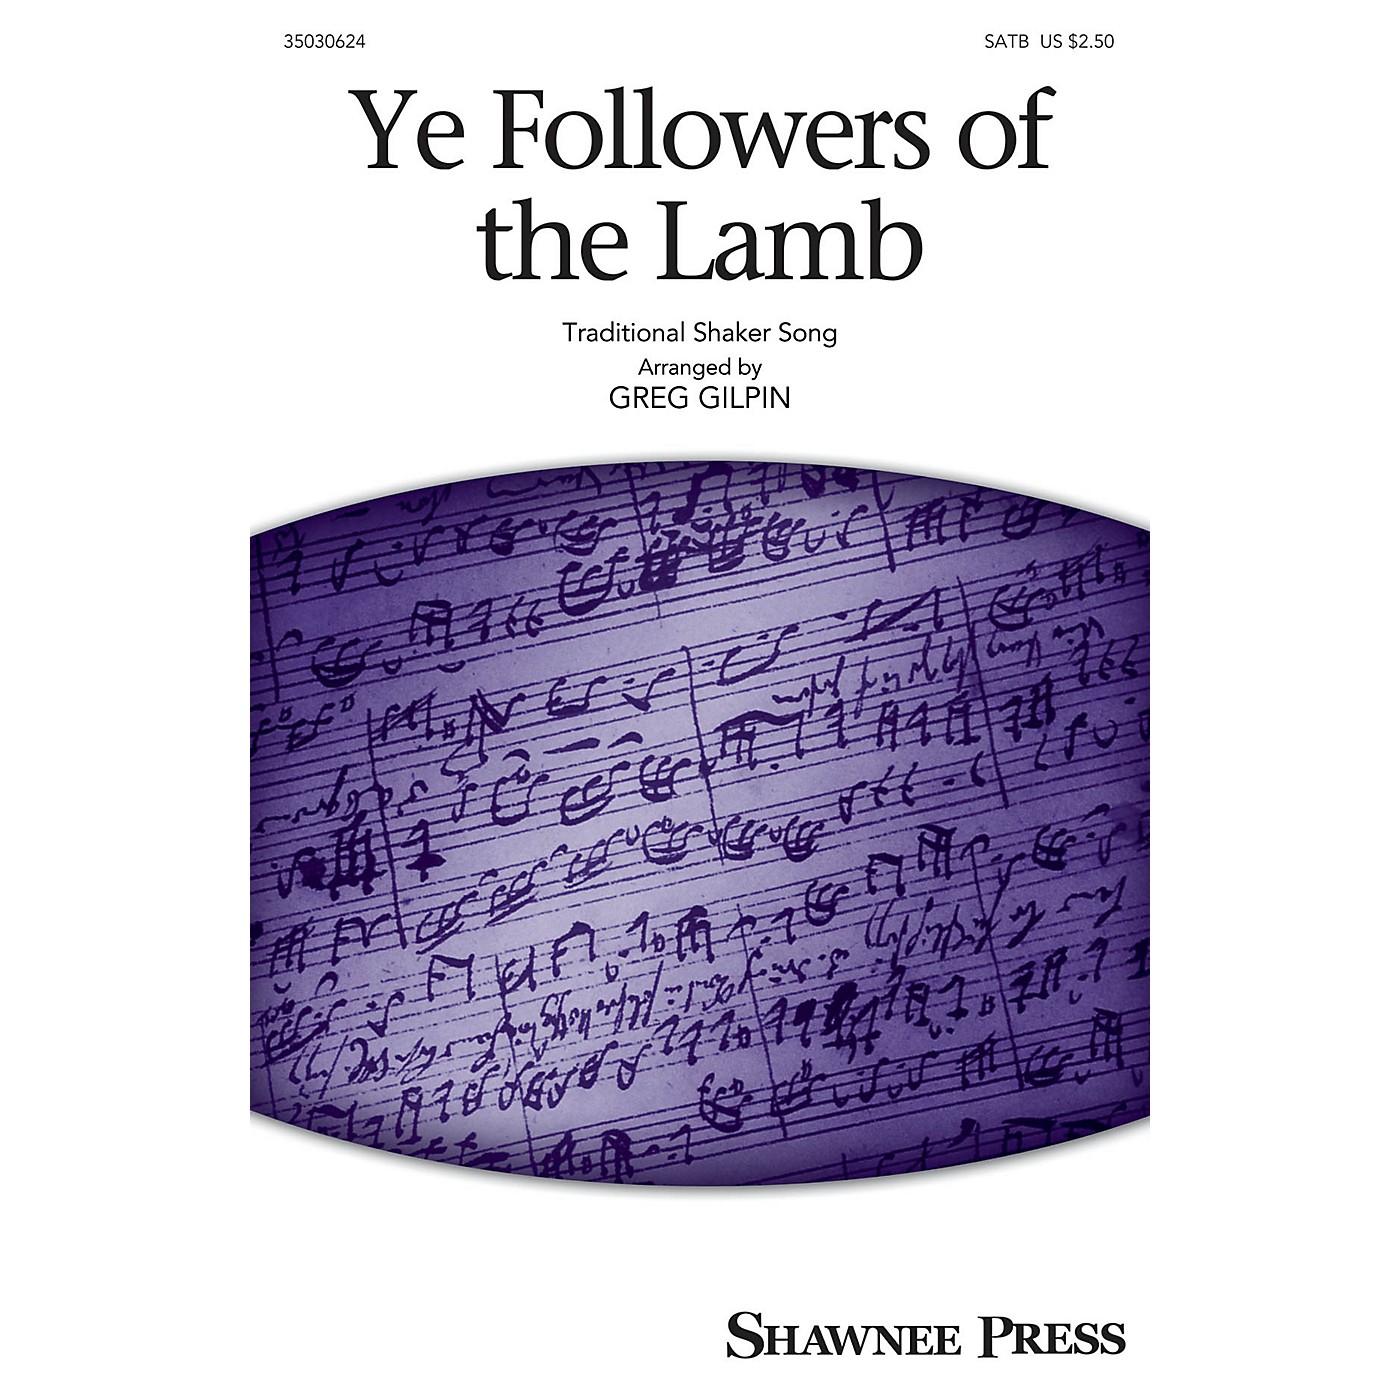 Shawnee Press Ye Followers of the Lamb SATB arranged by Greg Gilpin thumbnail